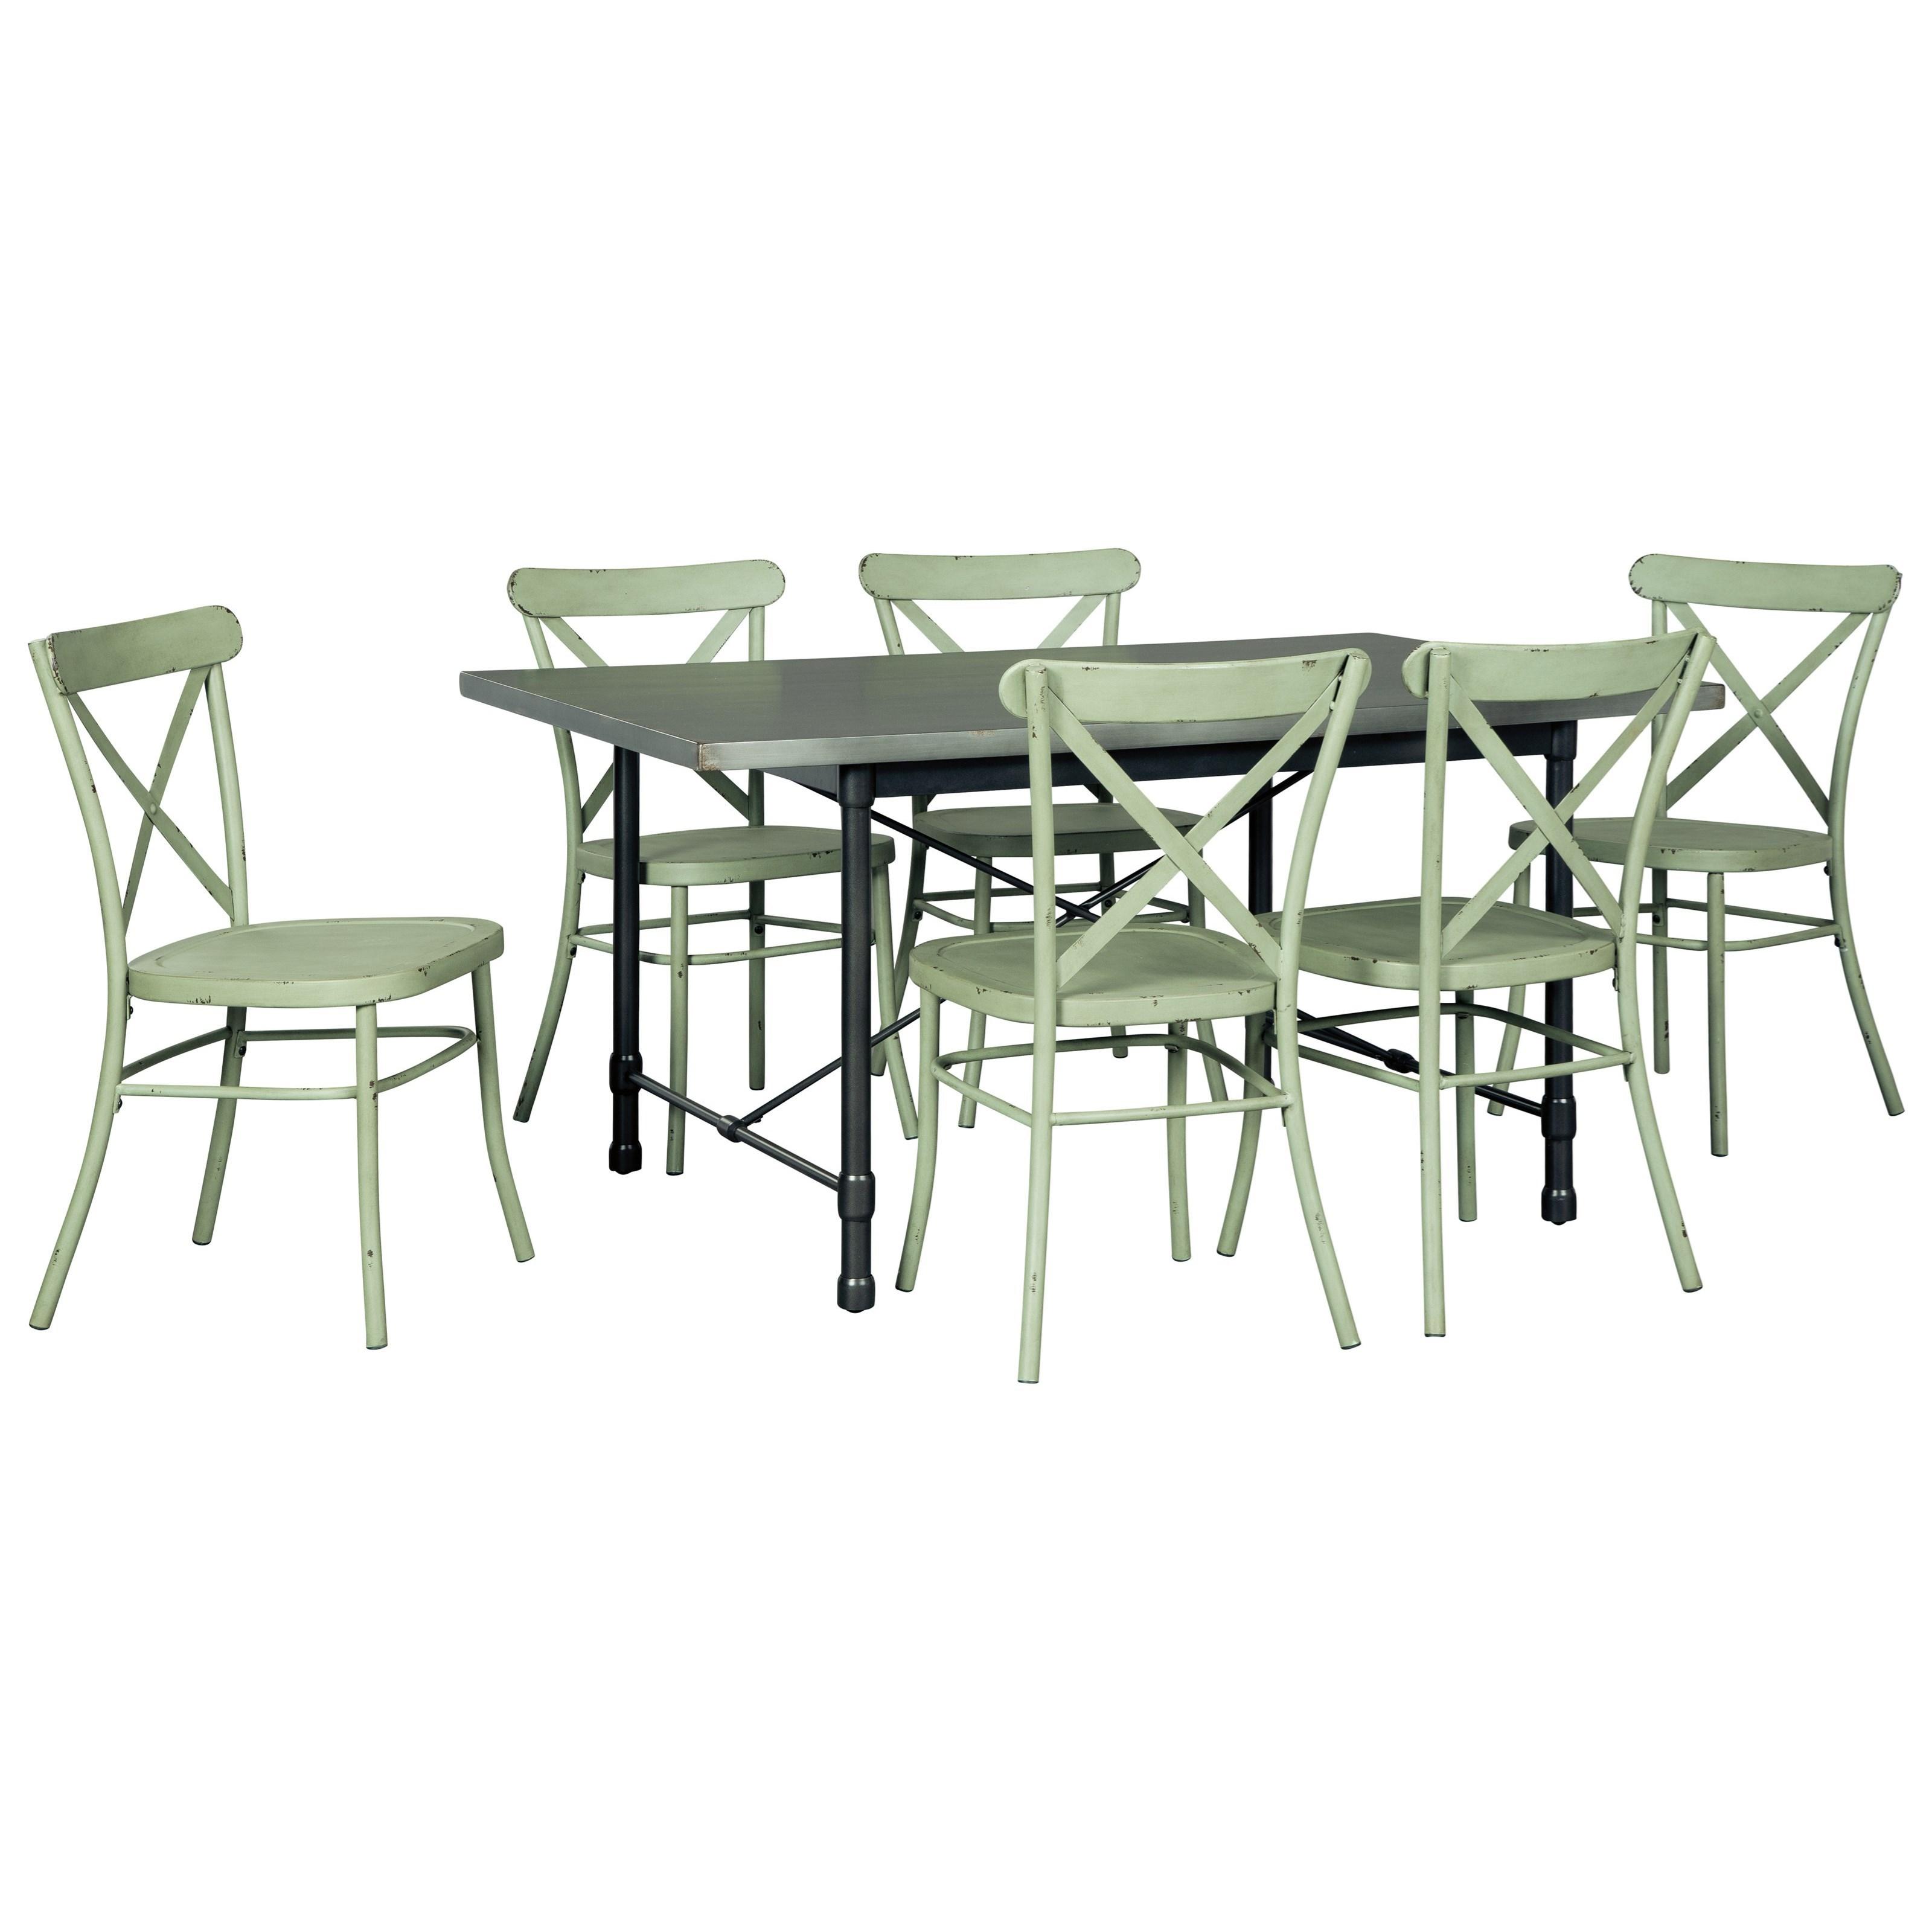 Signature Design By Ashley Minnona 7 Piece Rectangular Dining Set W Light Green Chairs Value